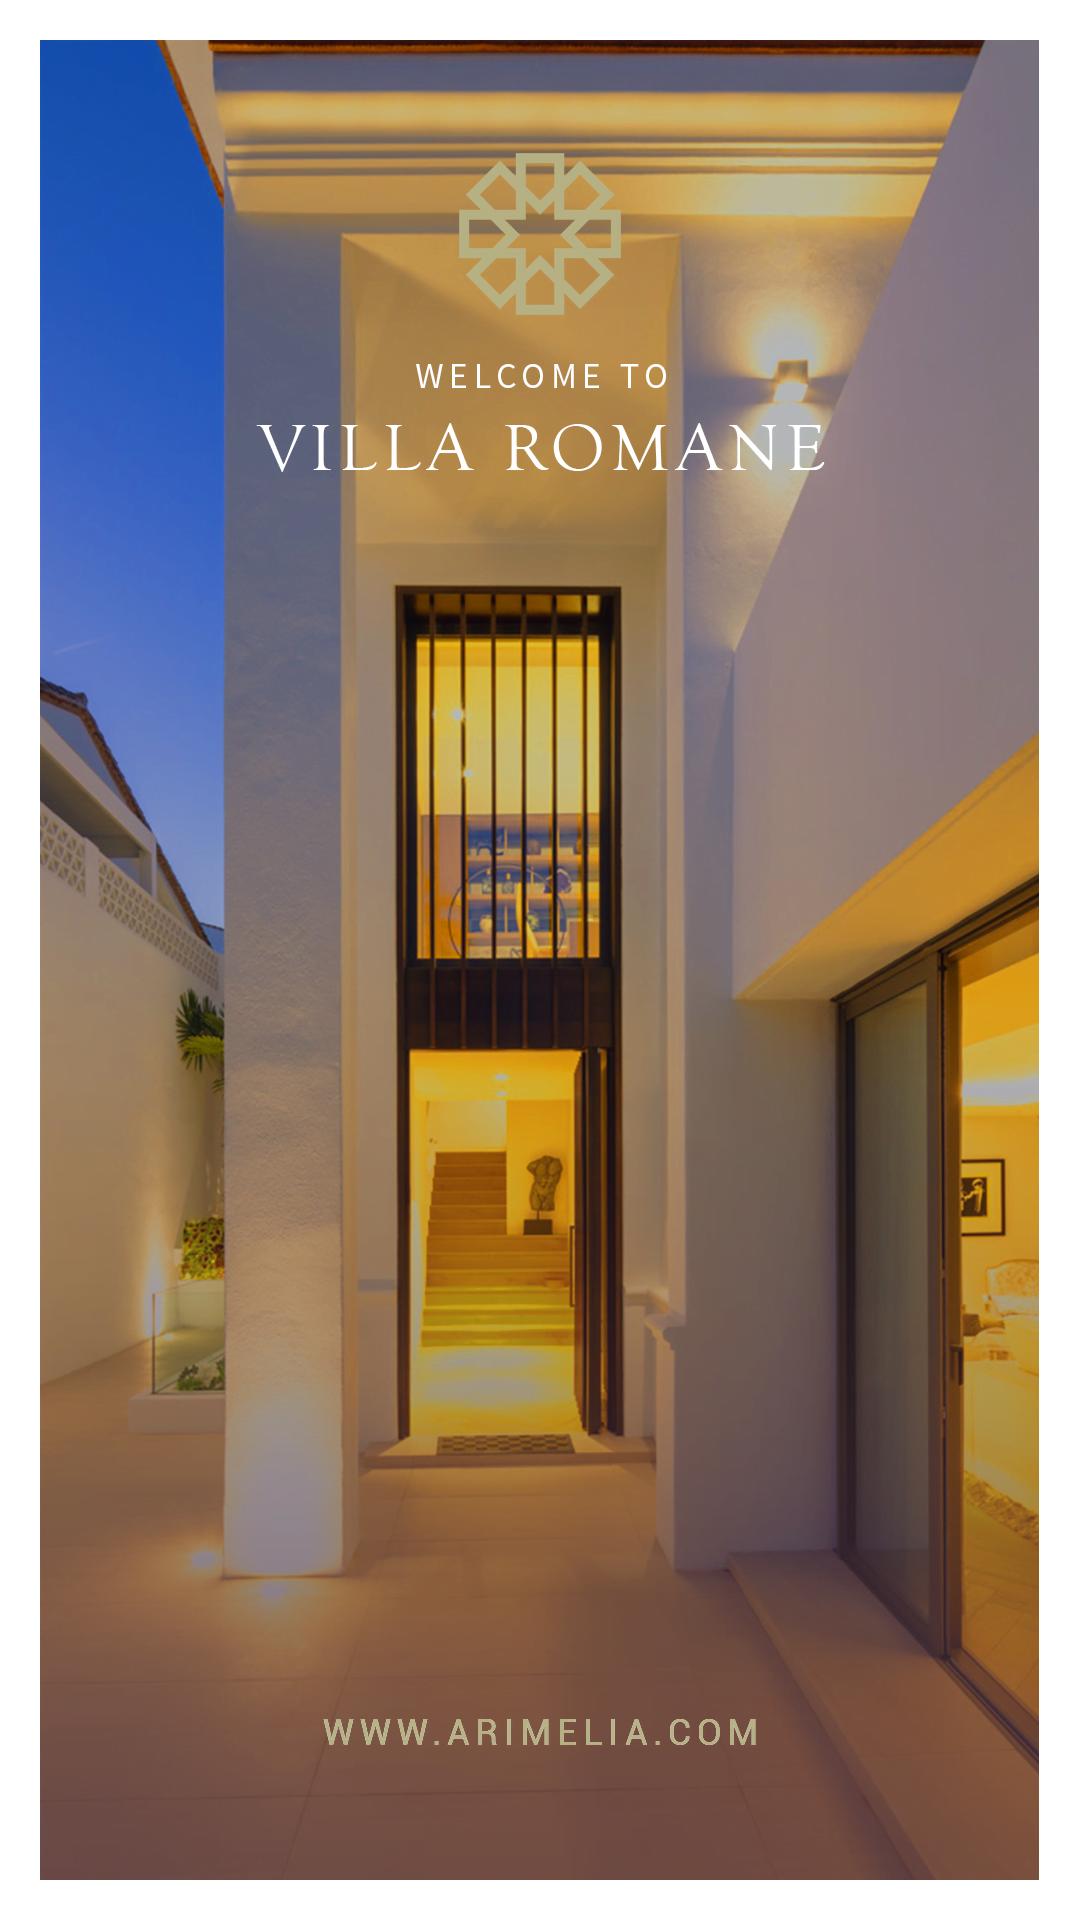 Luxury Villa Rental Story Template